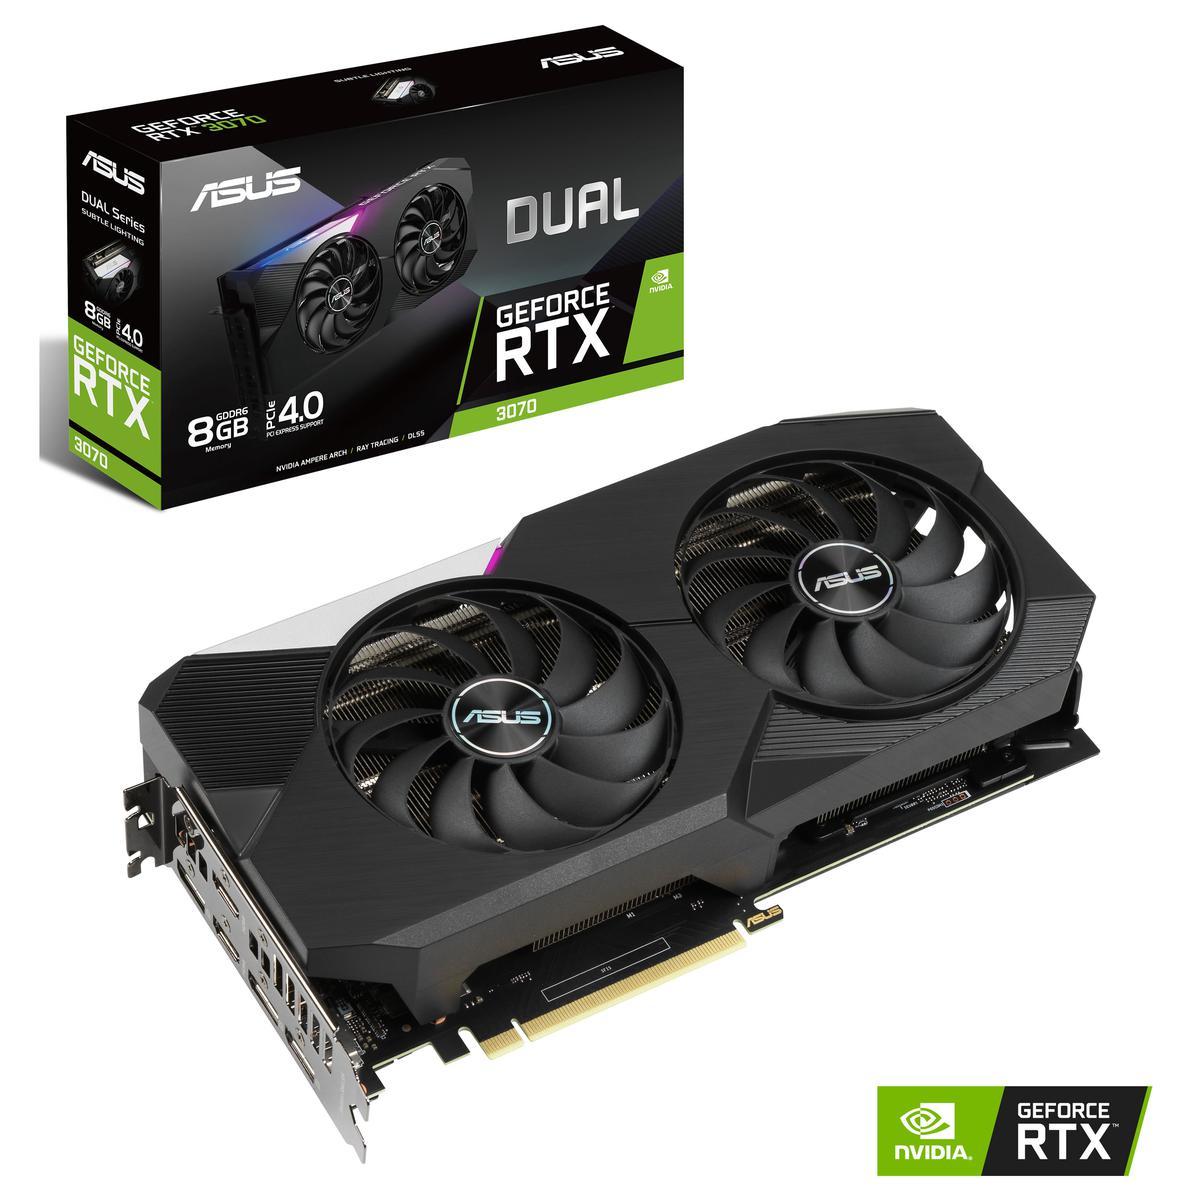 Asus GeForce RTX 3070 8 GB DUAL Video Card